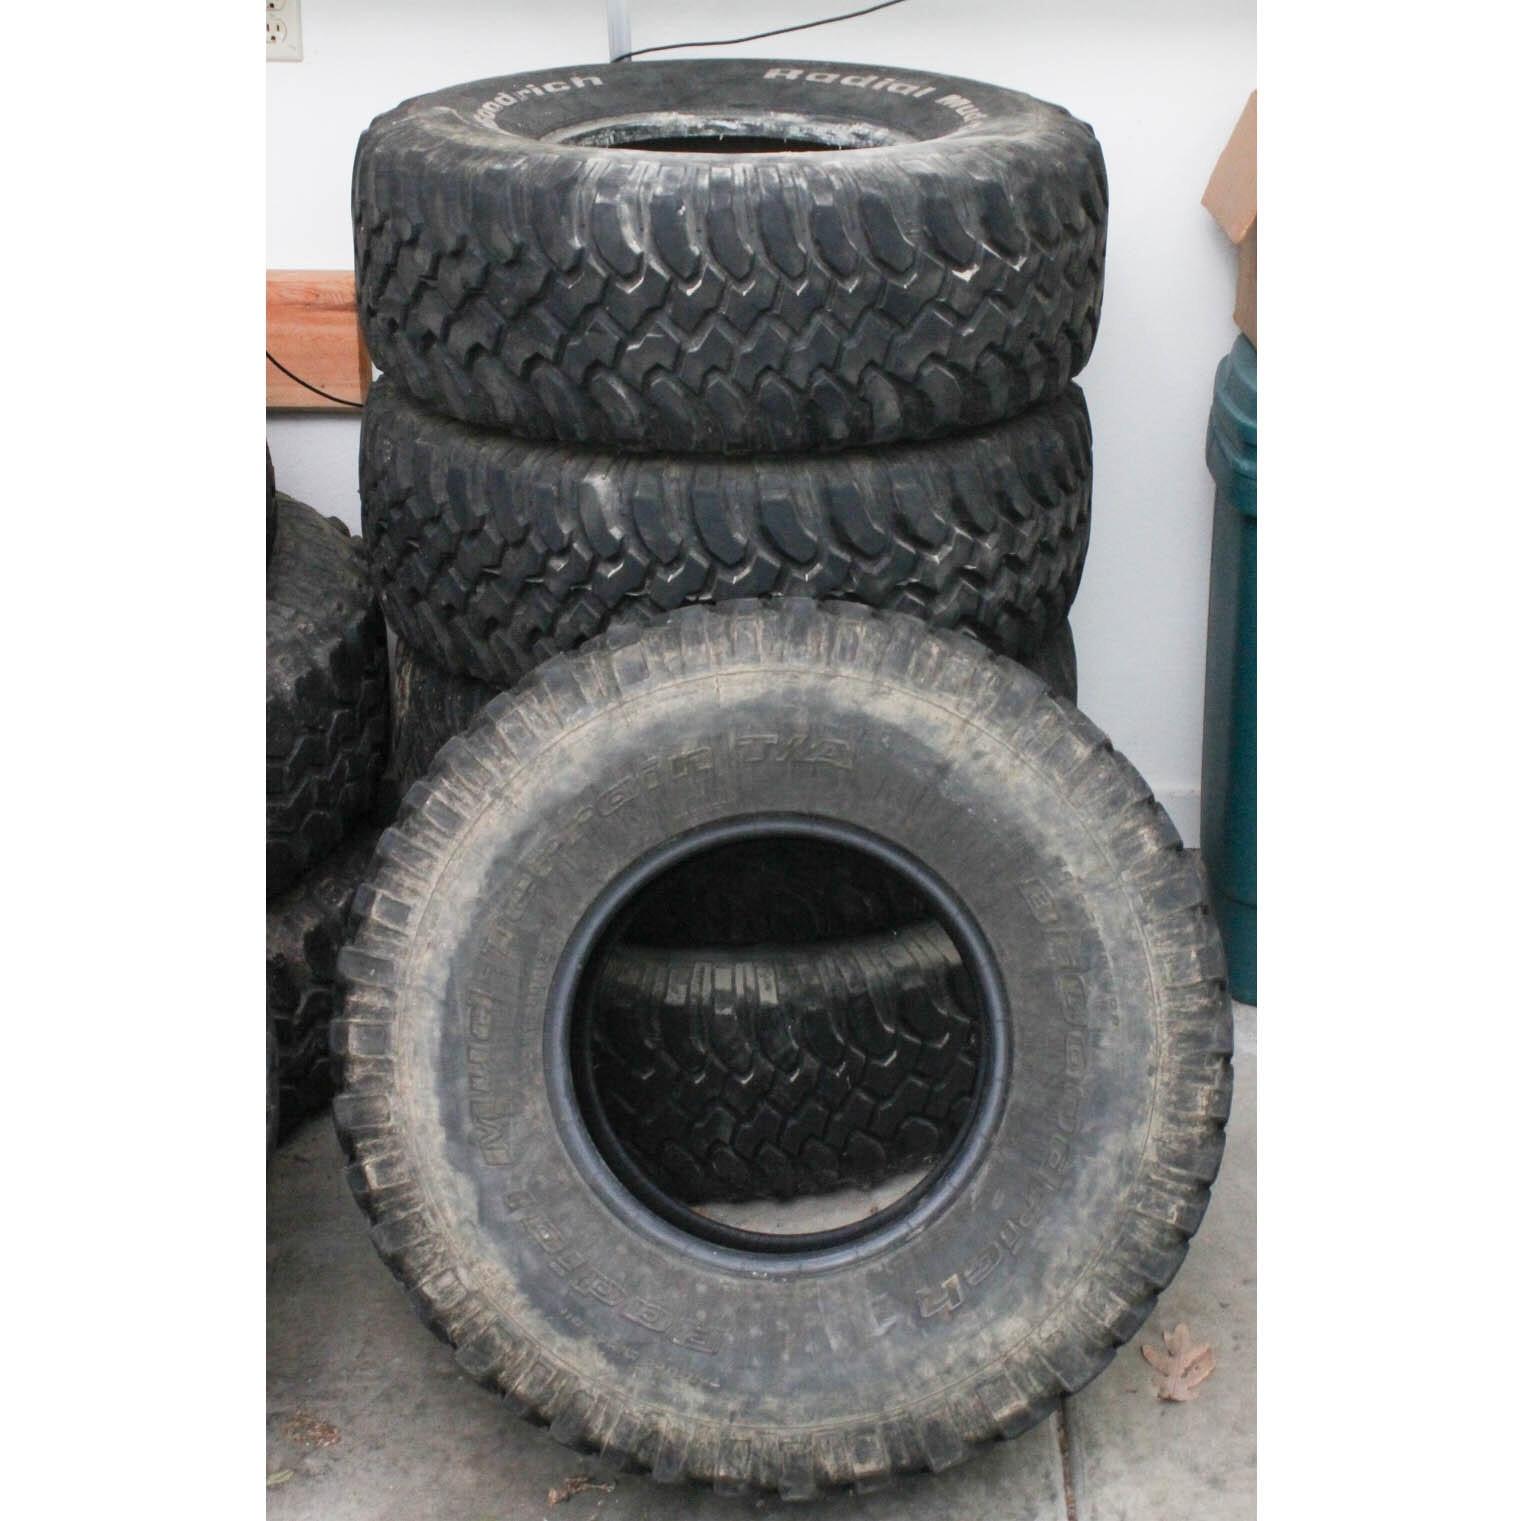 Five BFGoodrich Radial Mud-Terrain Tires